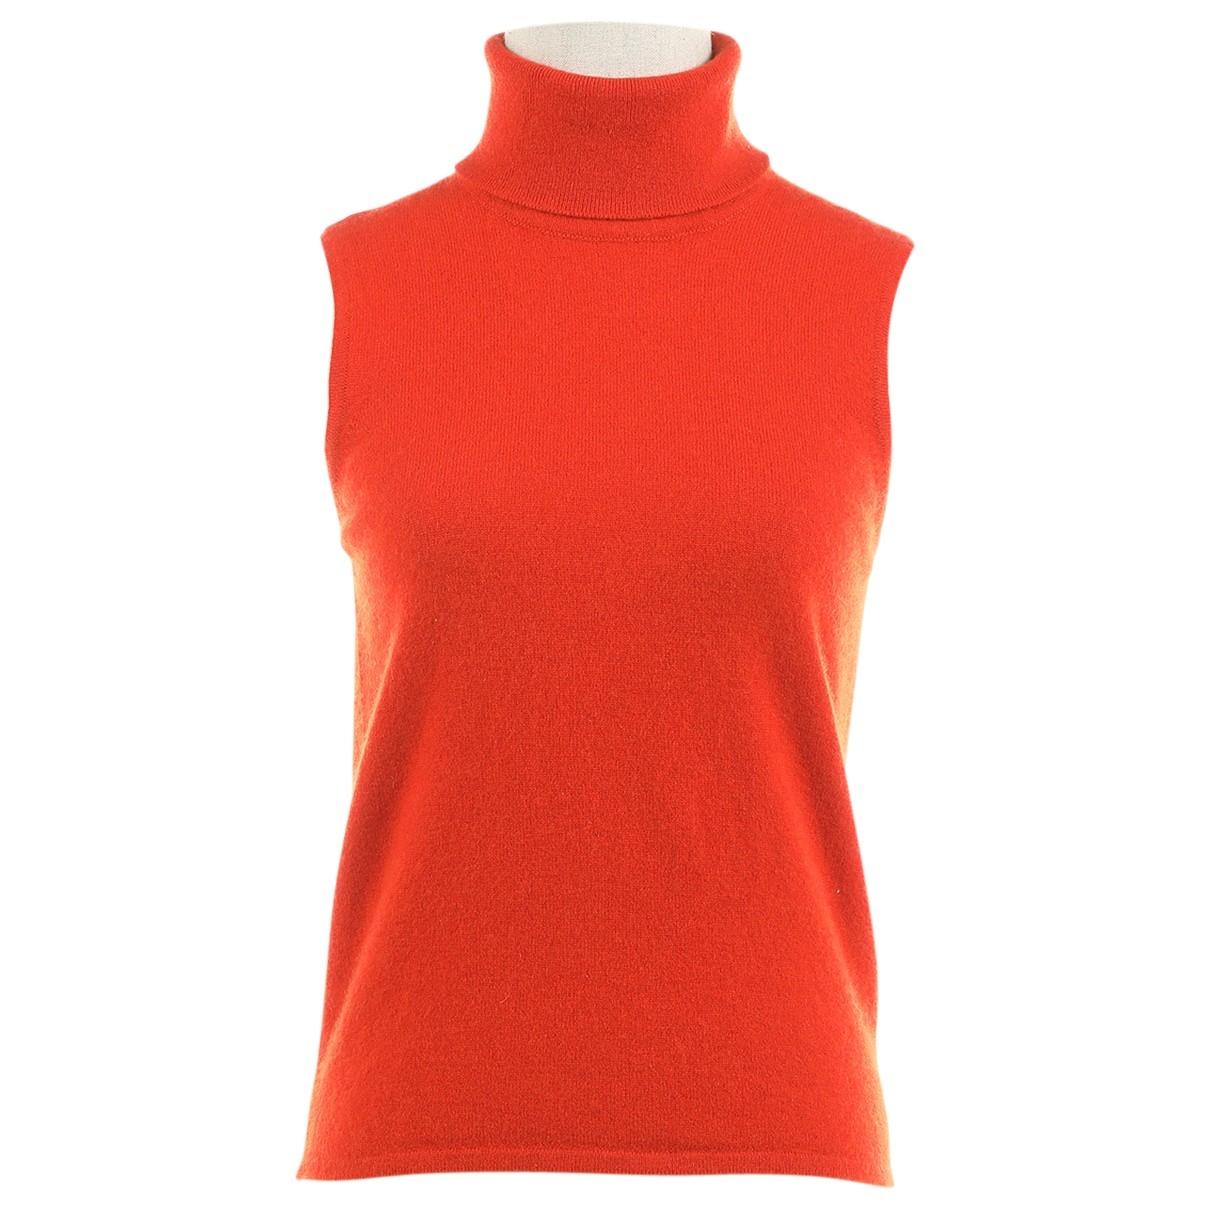 Hermes - Pull   pour femme en cachemire - orange